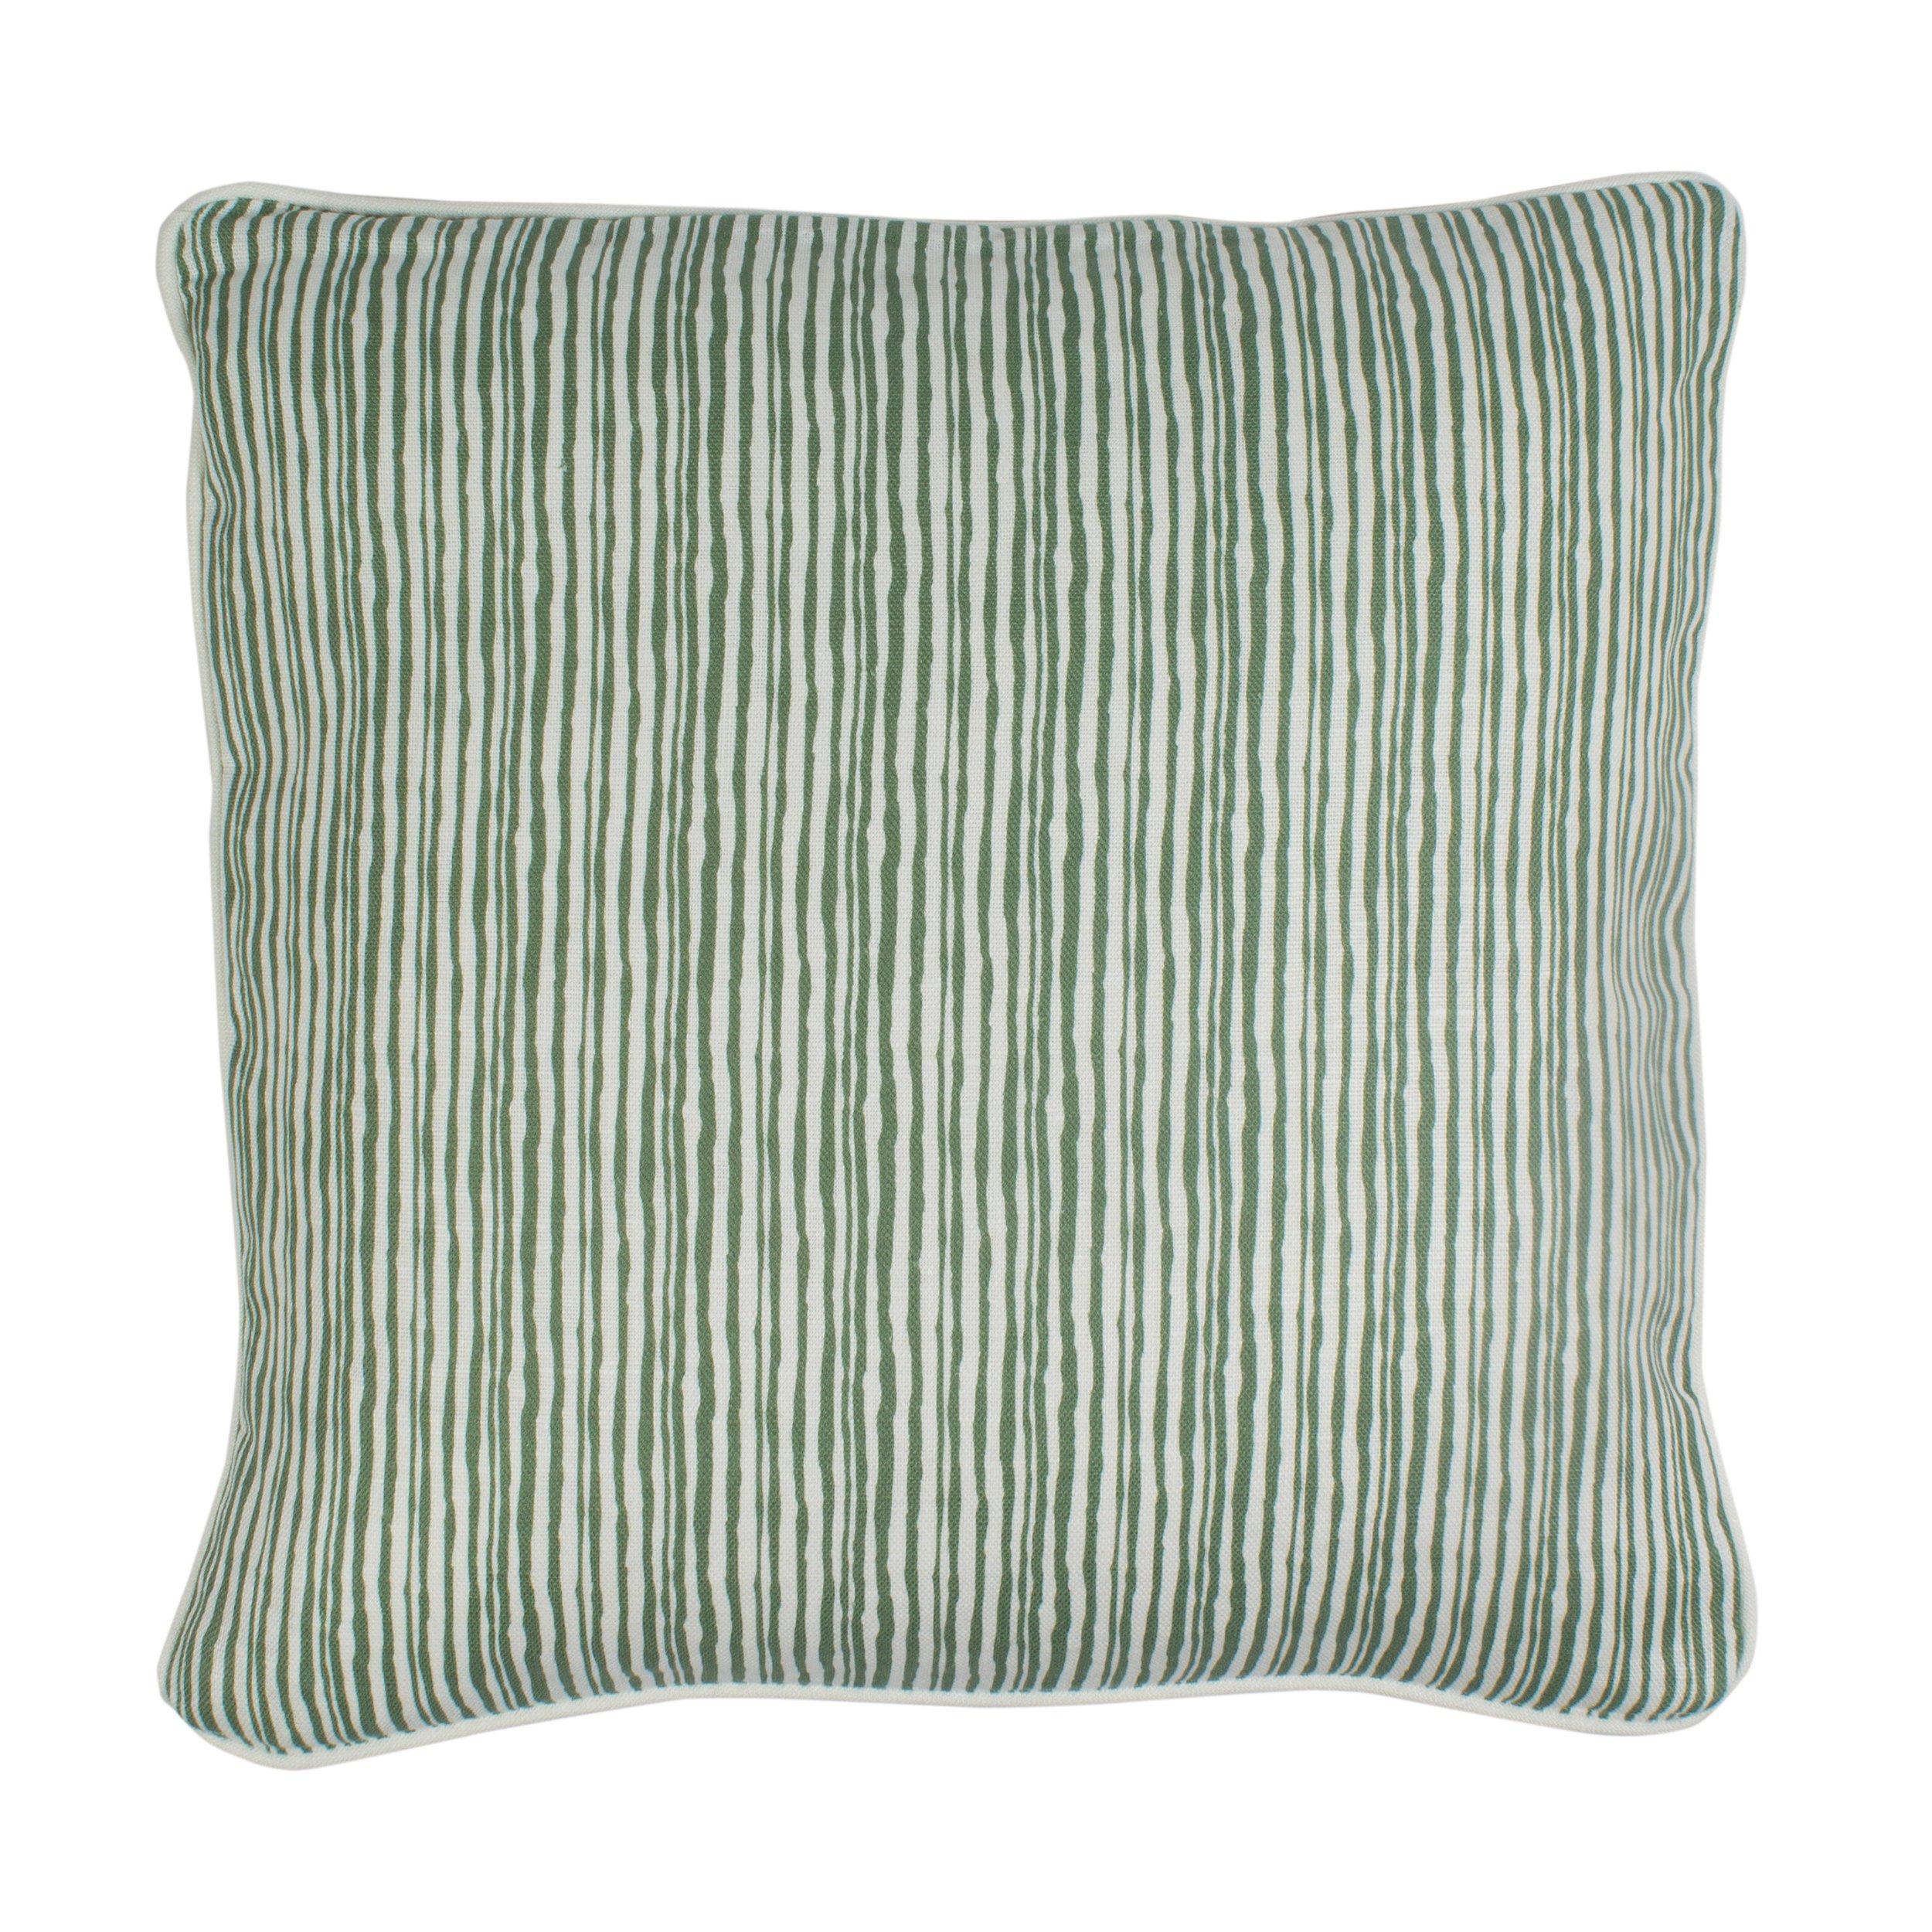 Pillow_greenstripe.jpg